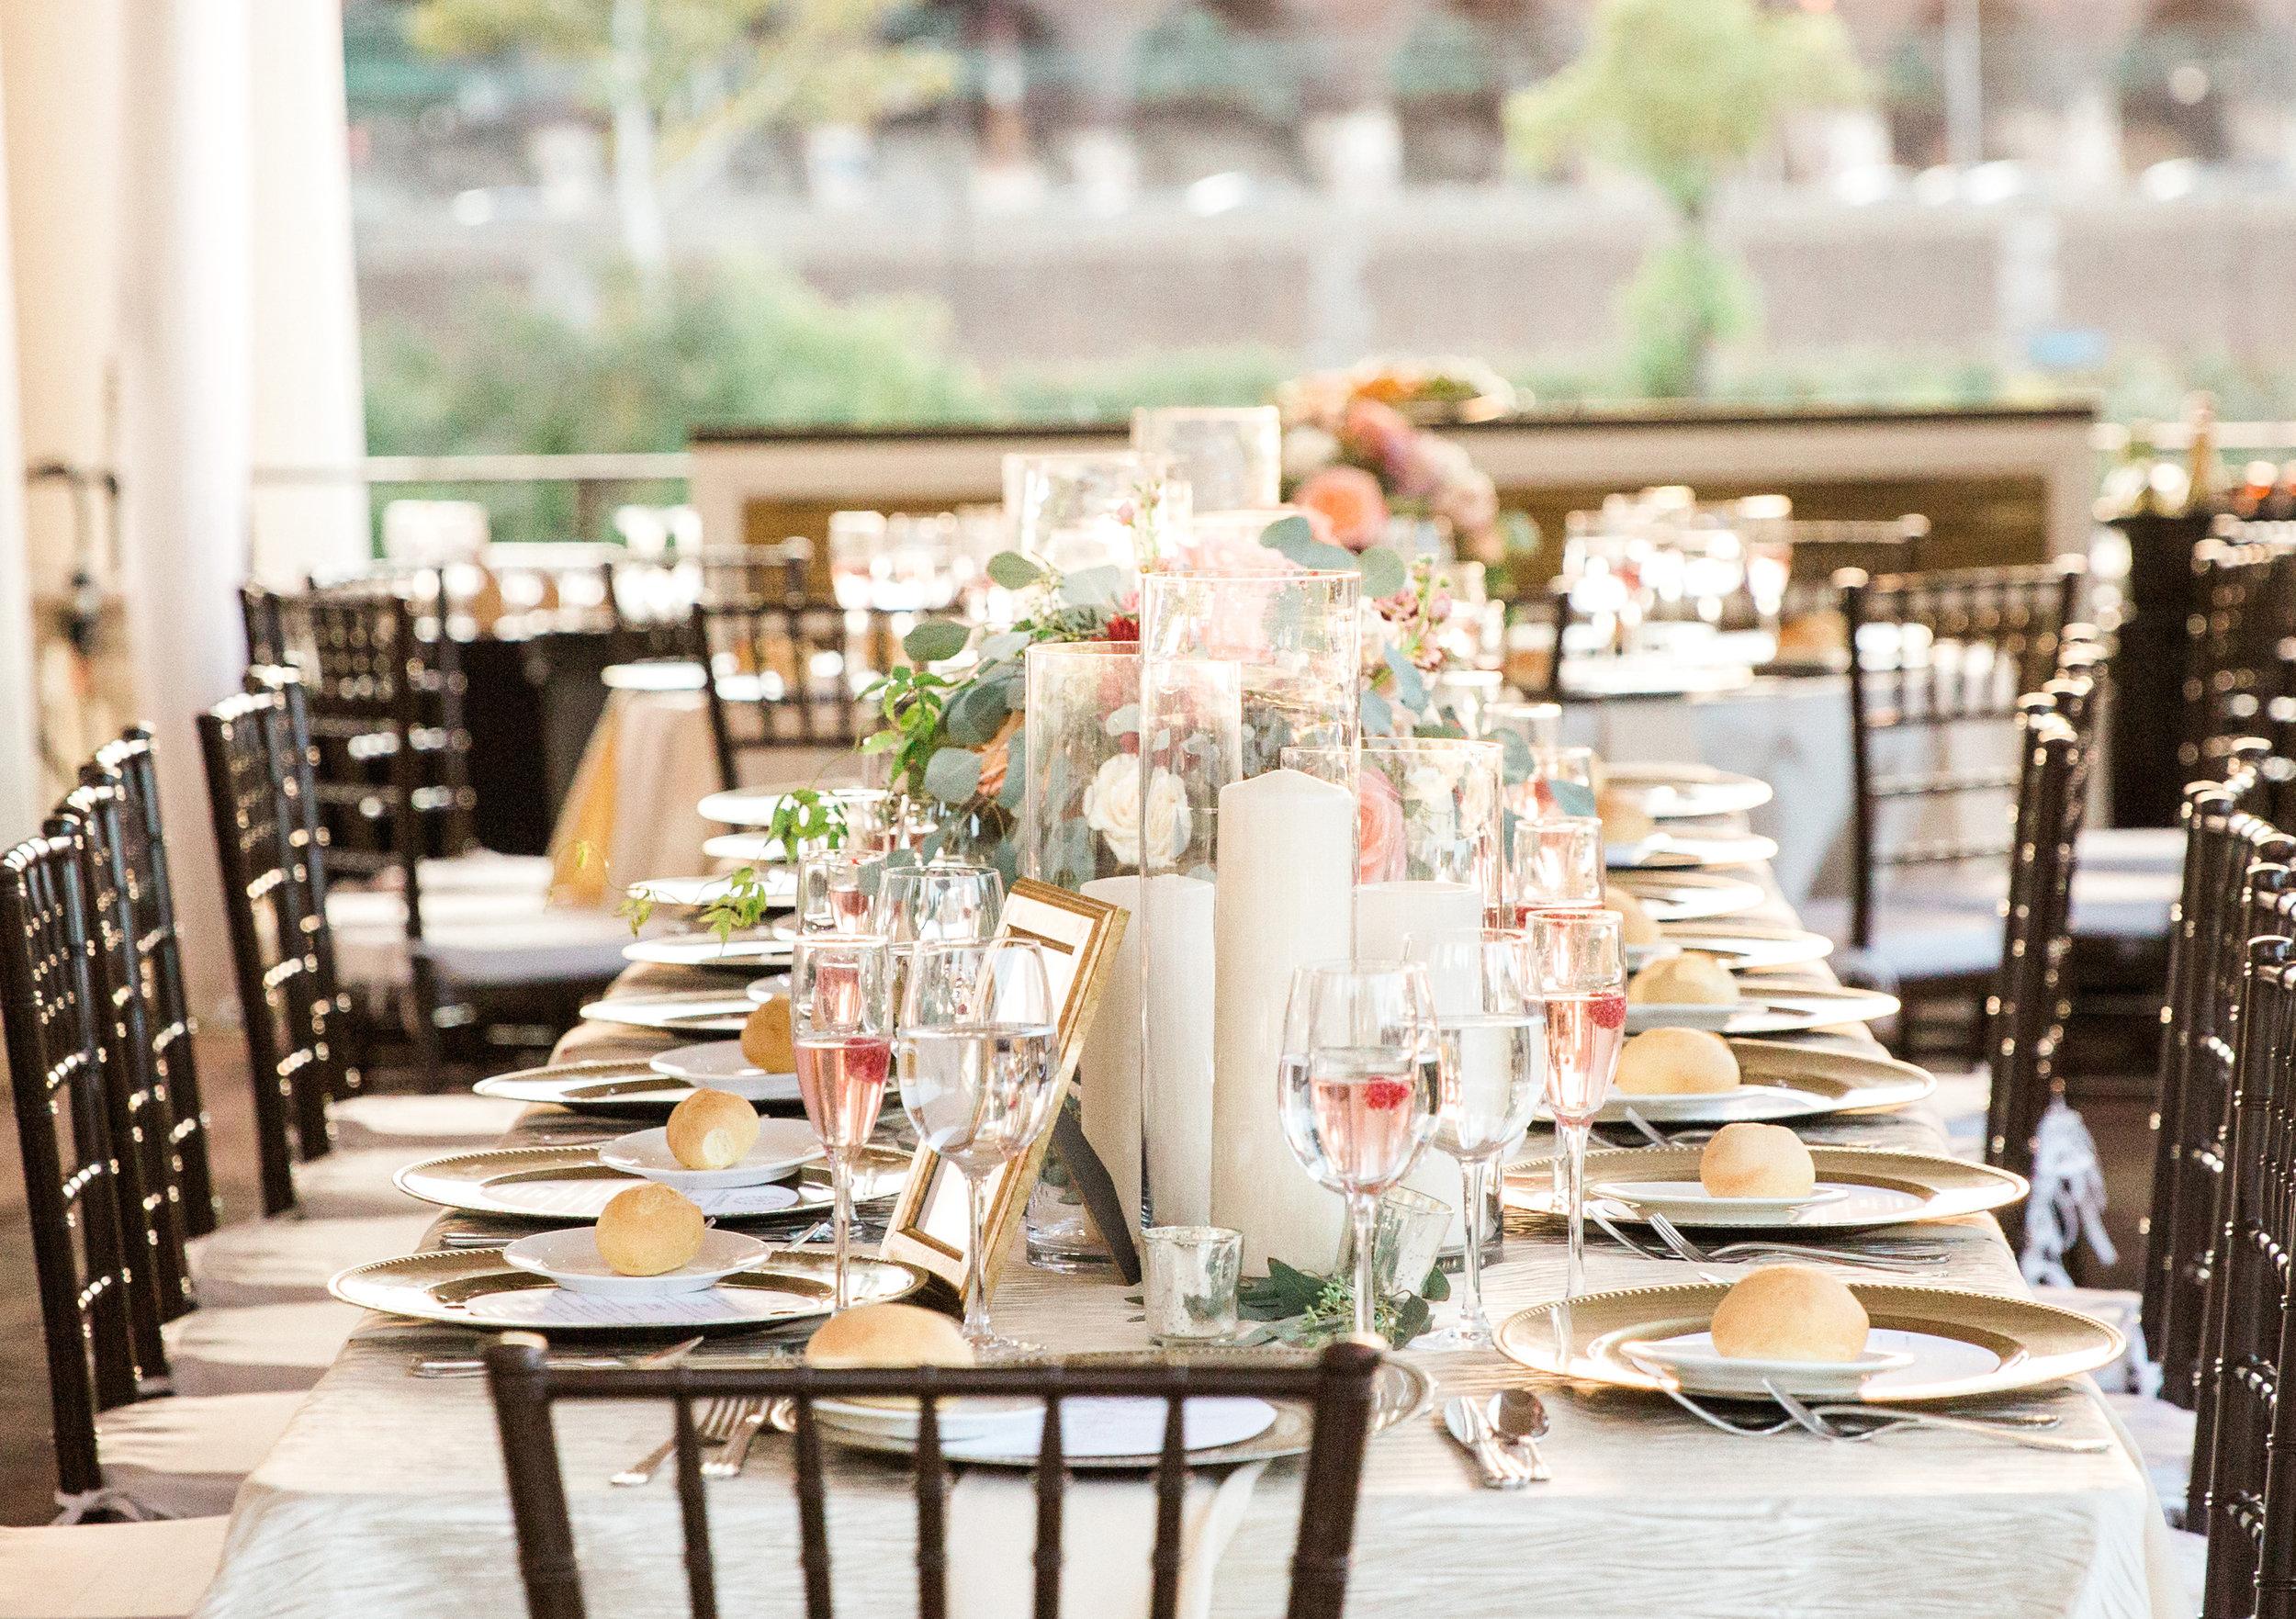 Hudson-Nichols-Black-Tie-Bride-Philadelphia-Waterworks-Wedding-Cescaphe-Reception-Floral-Details26.jpg